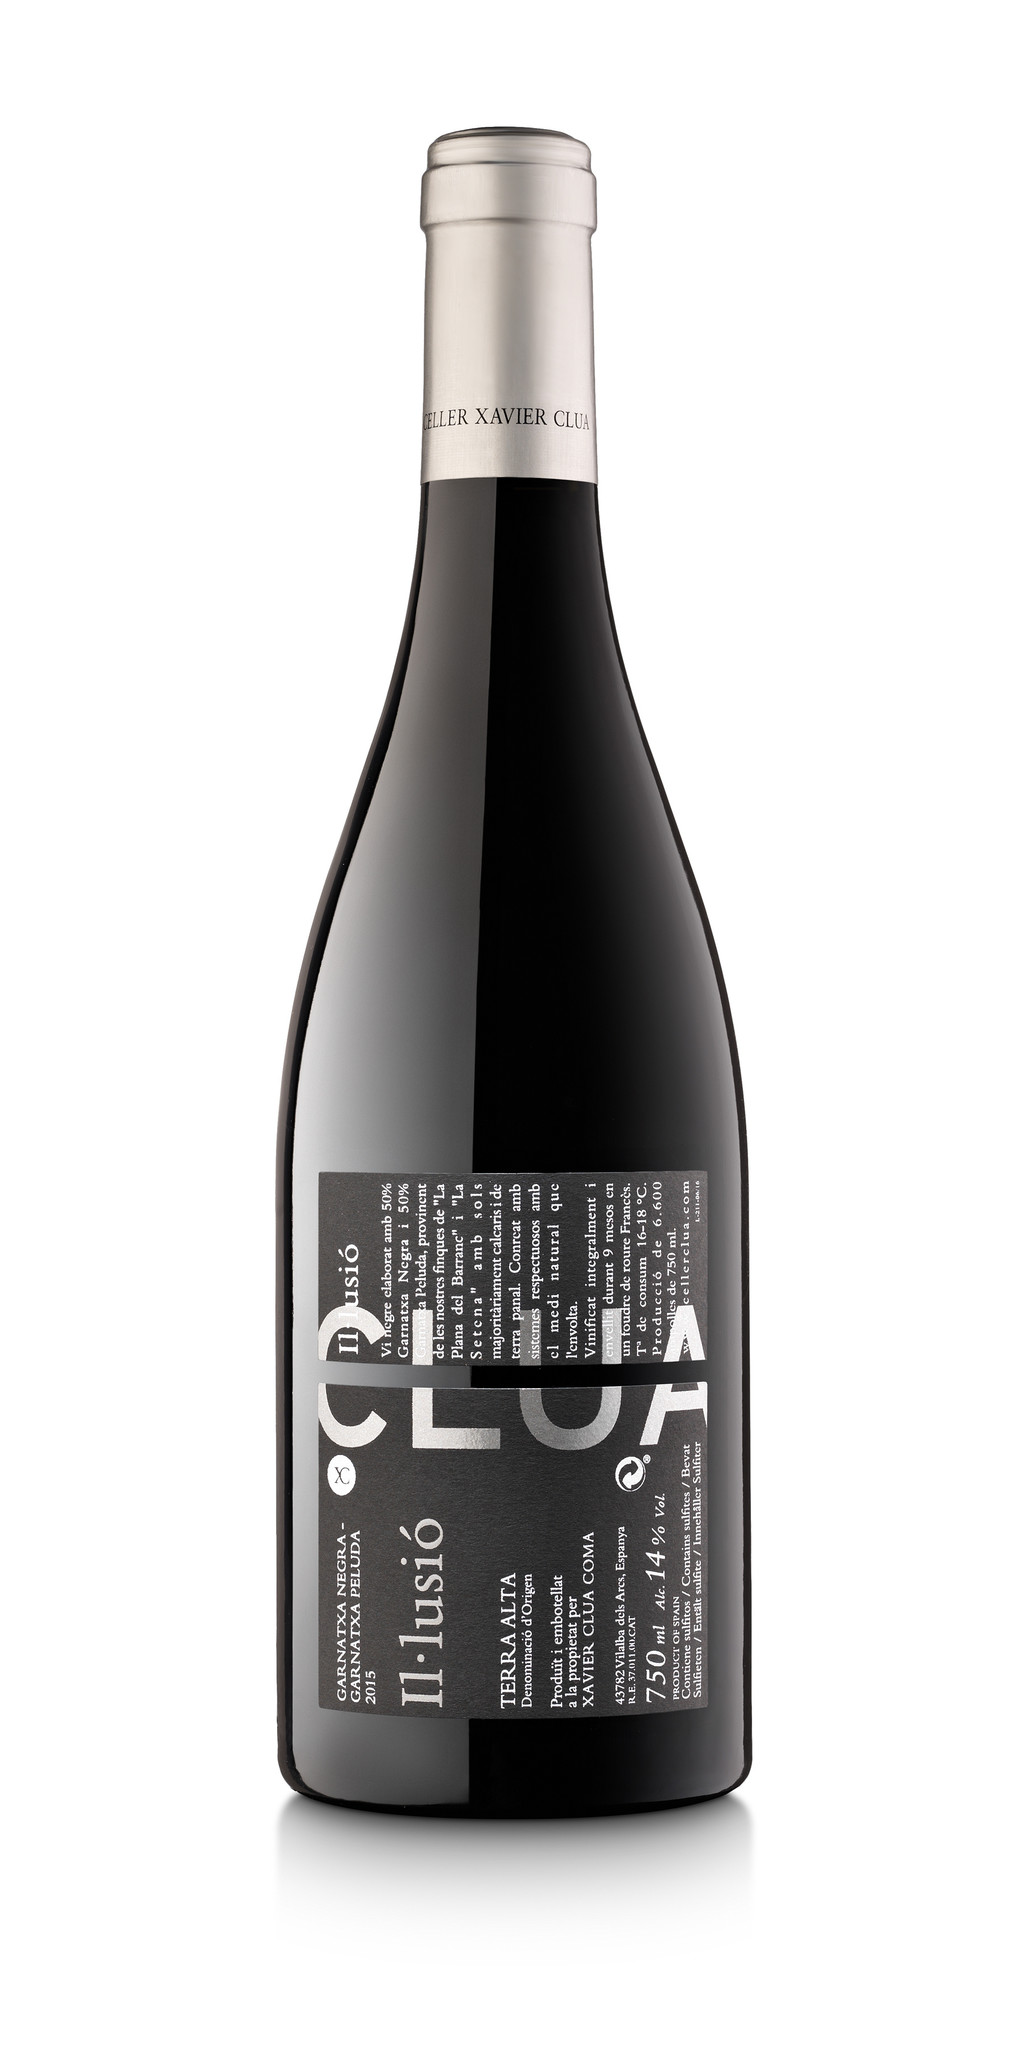 Clua Xavier, Garnatxa Negre Il.lussio, 2018